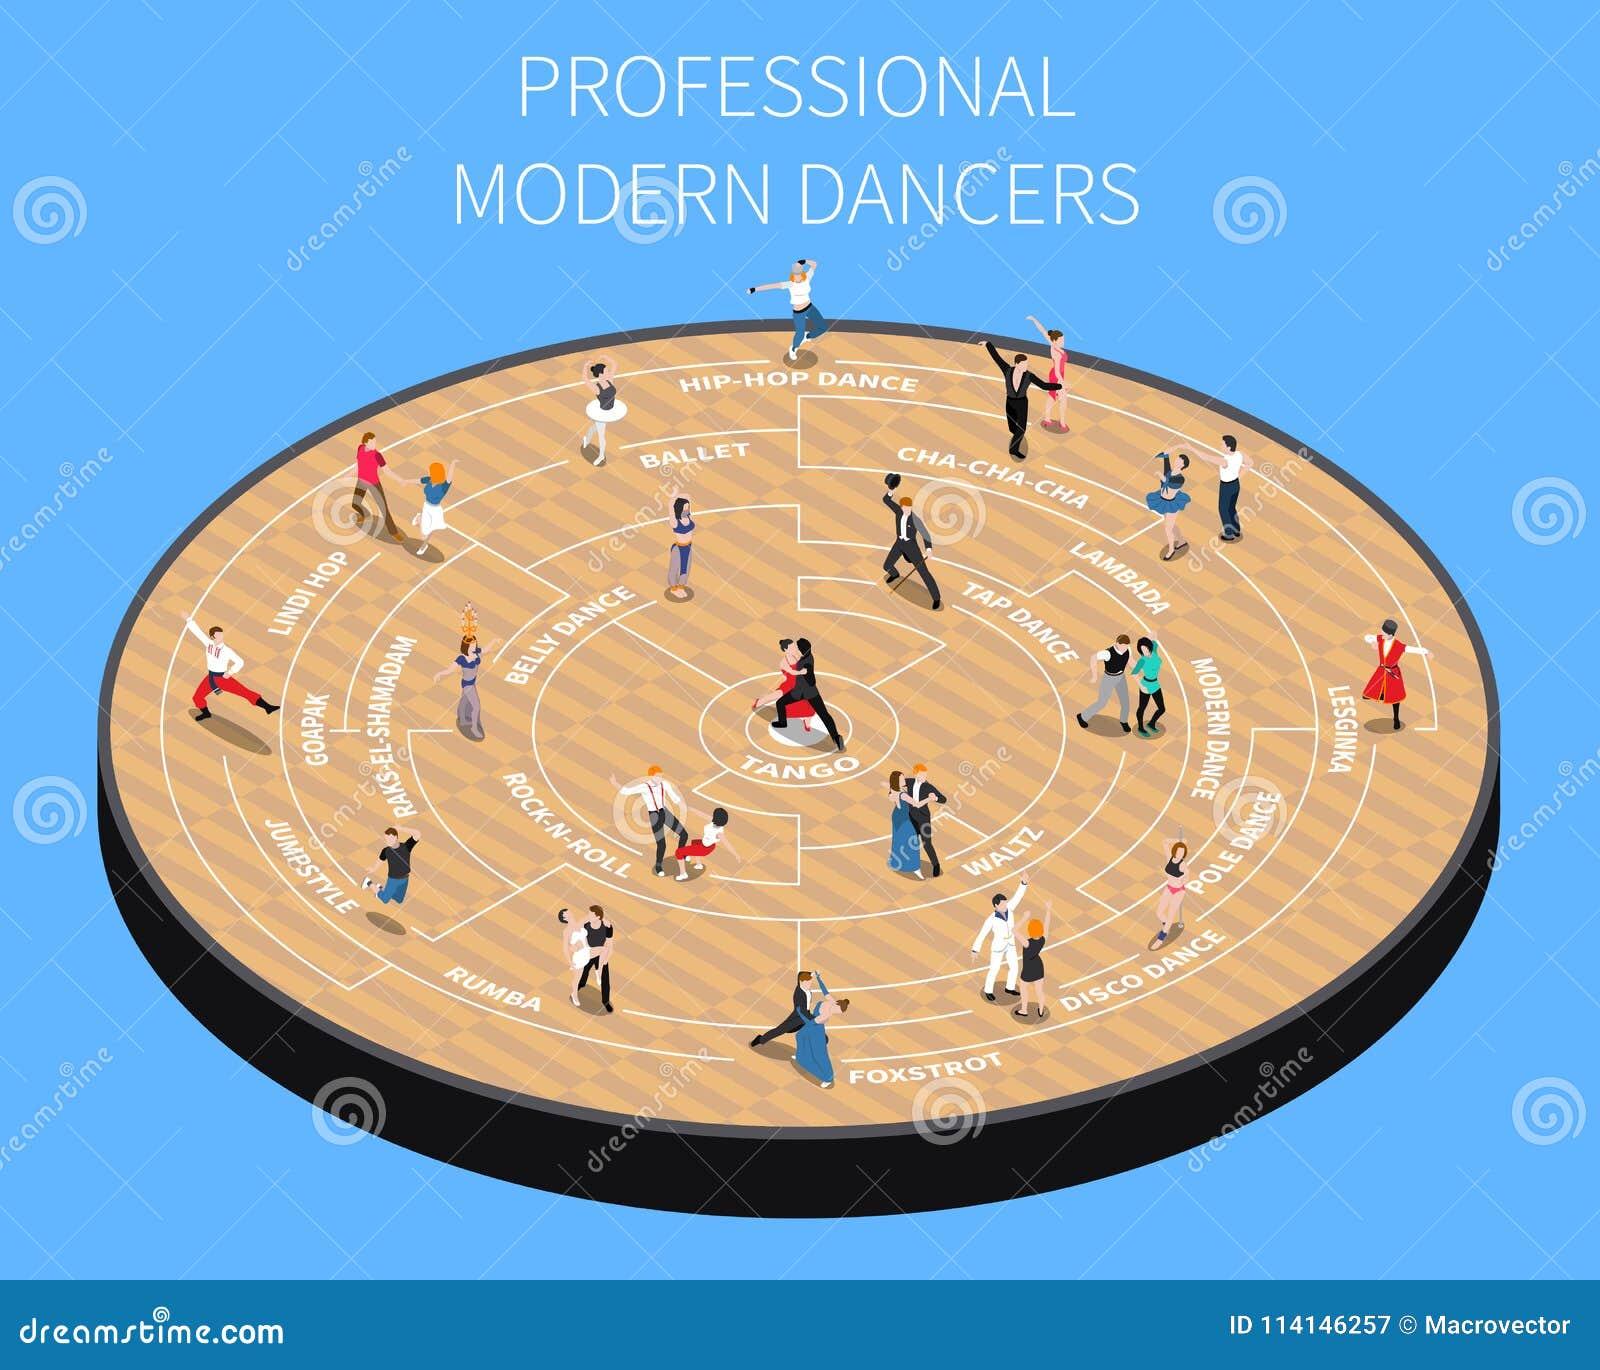 Professional Modern Dancers Isometric Flowchart